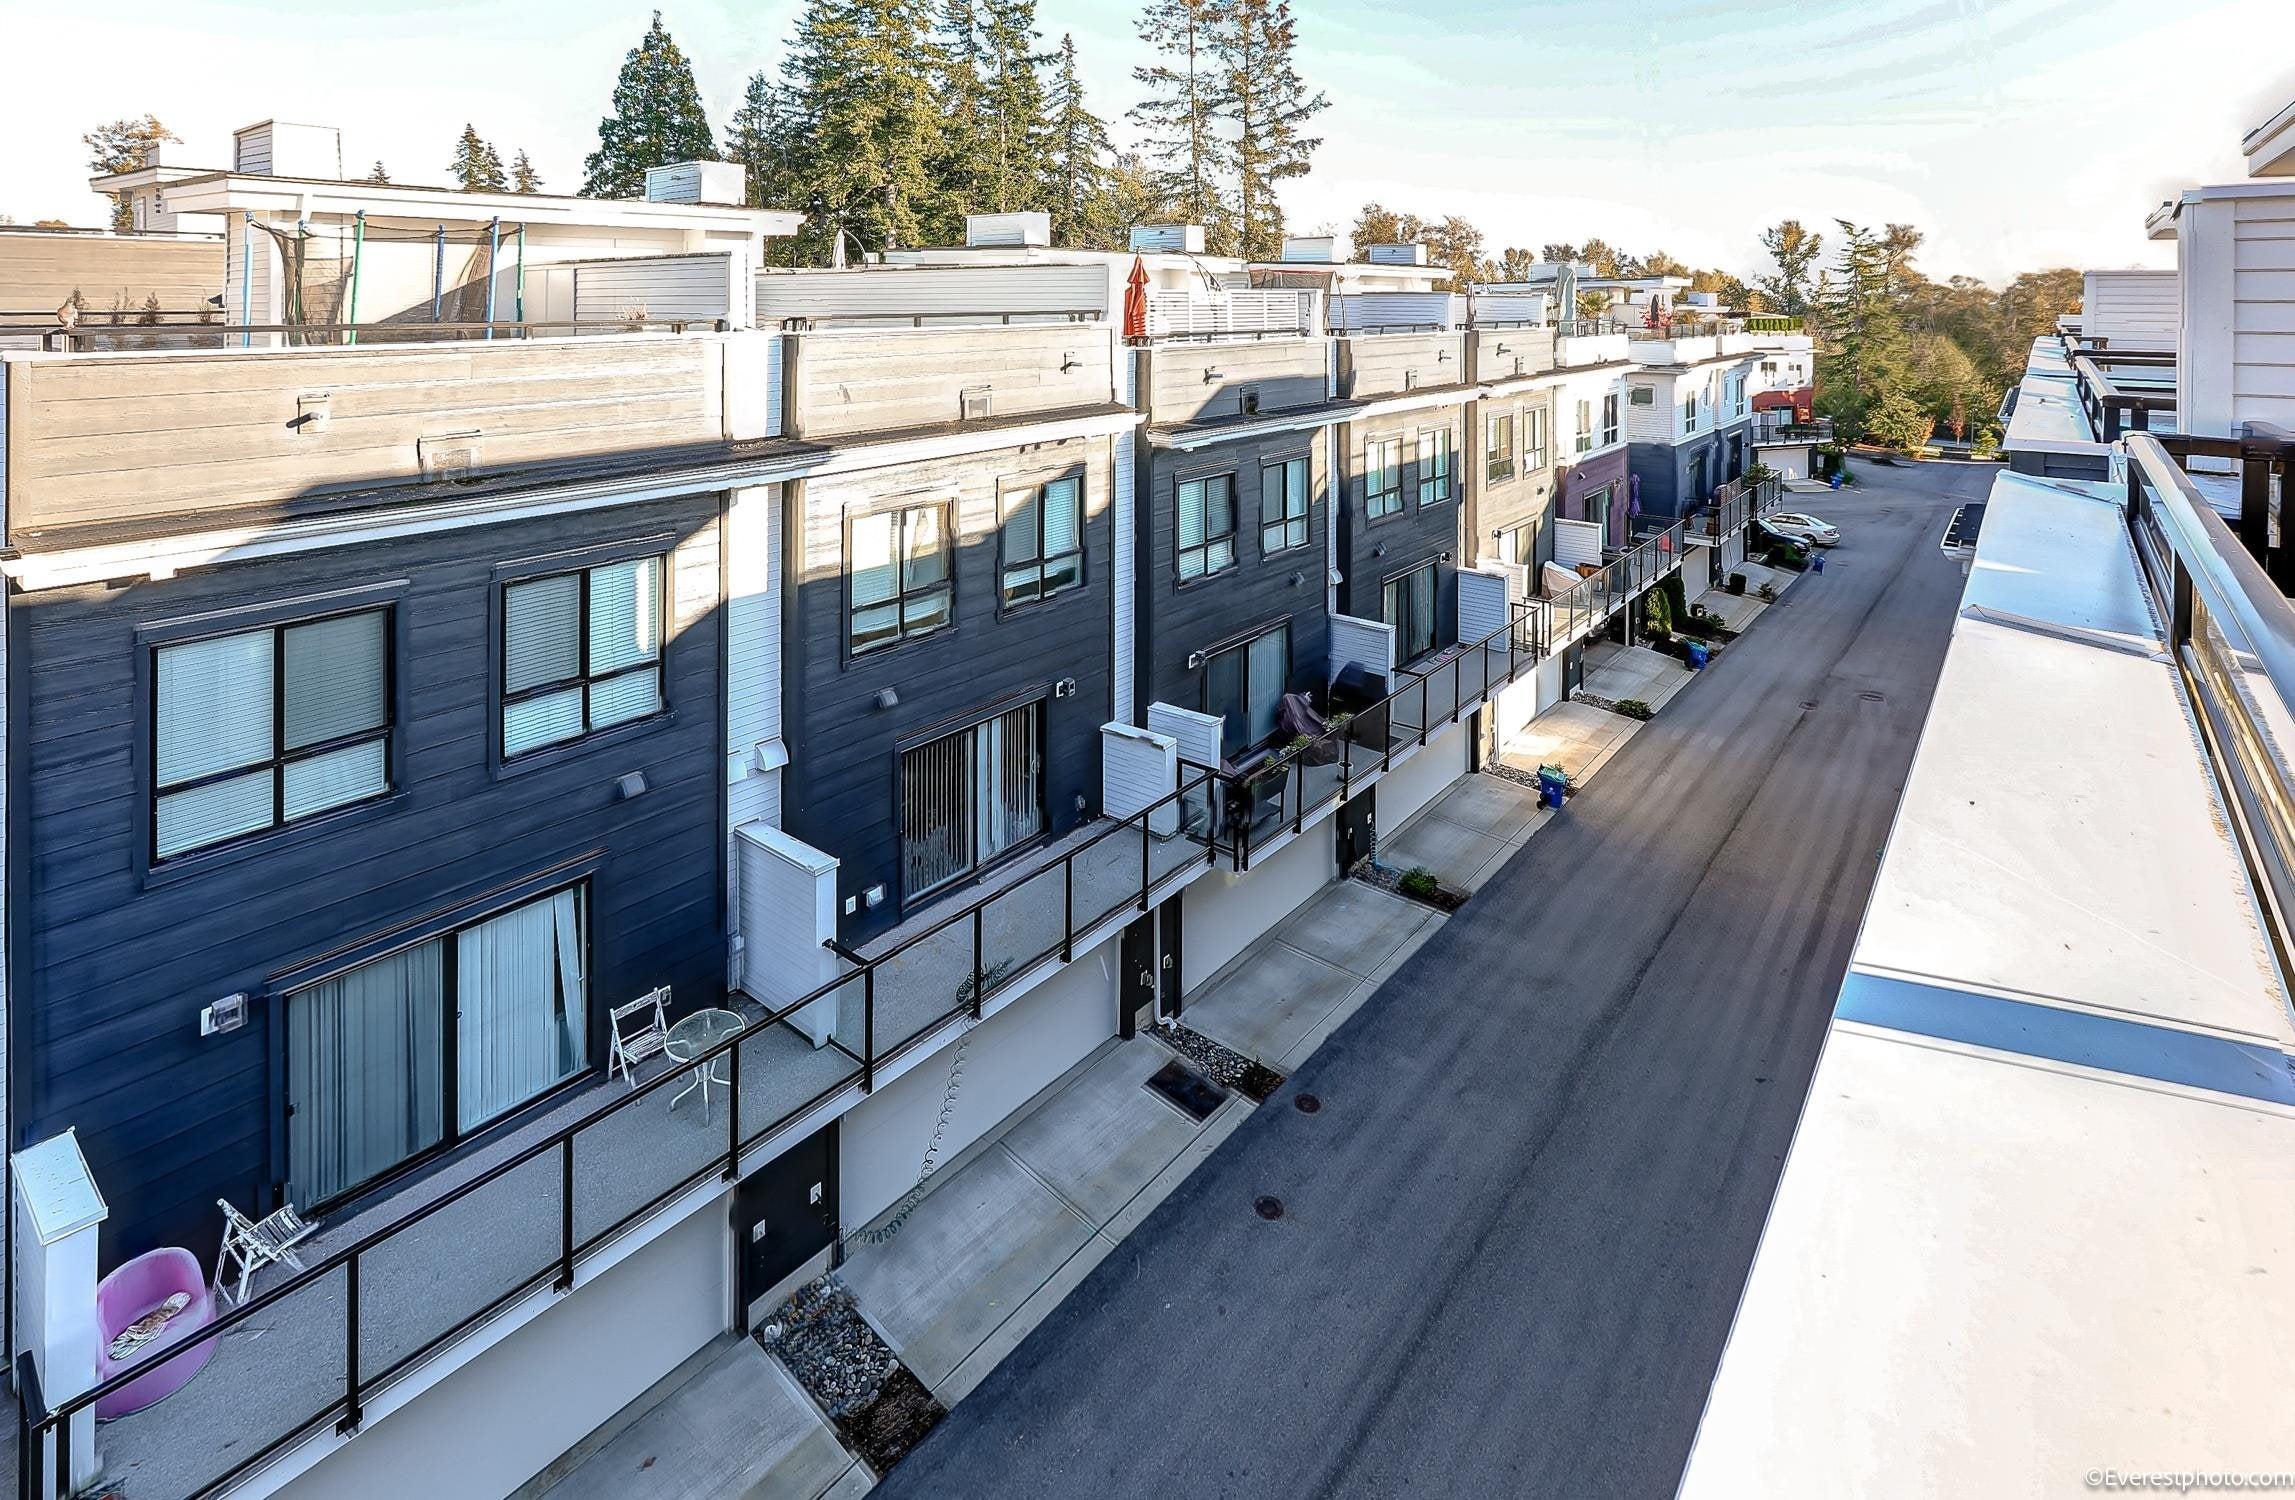 186 2277 OAK MEADOWS DRIVE - Grandview Surrey Townhouse for sale, 3 Bedrooms (R2624950) - #36